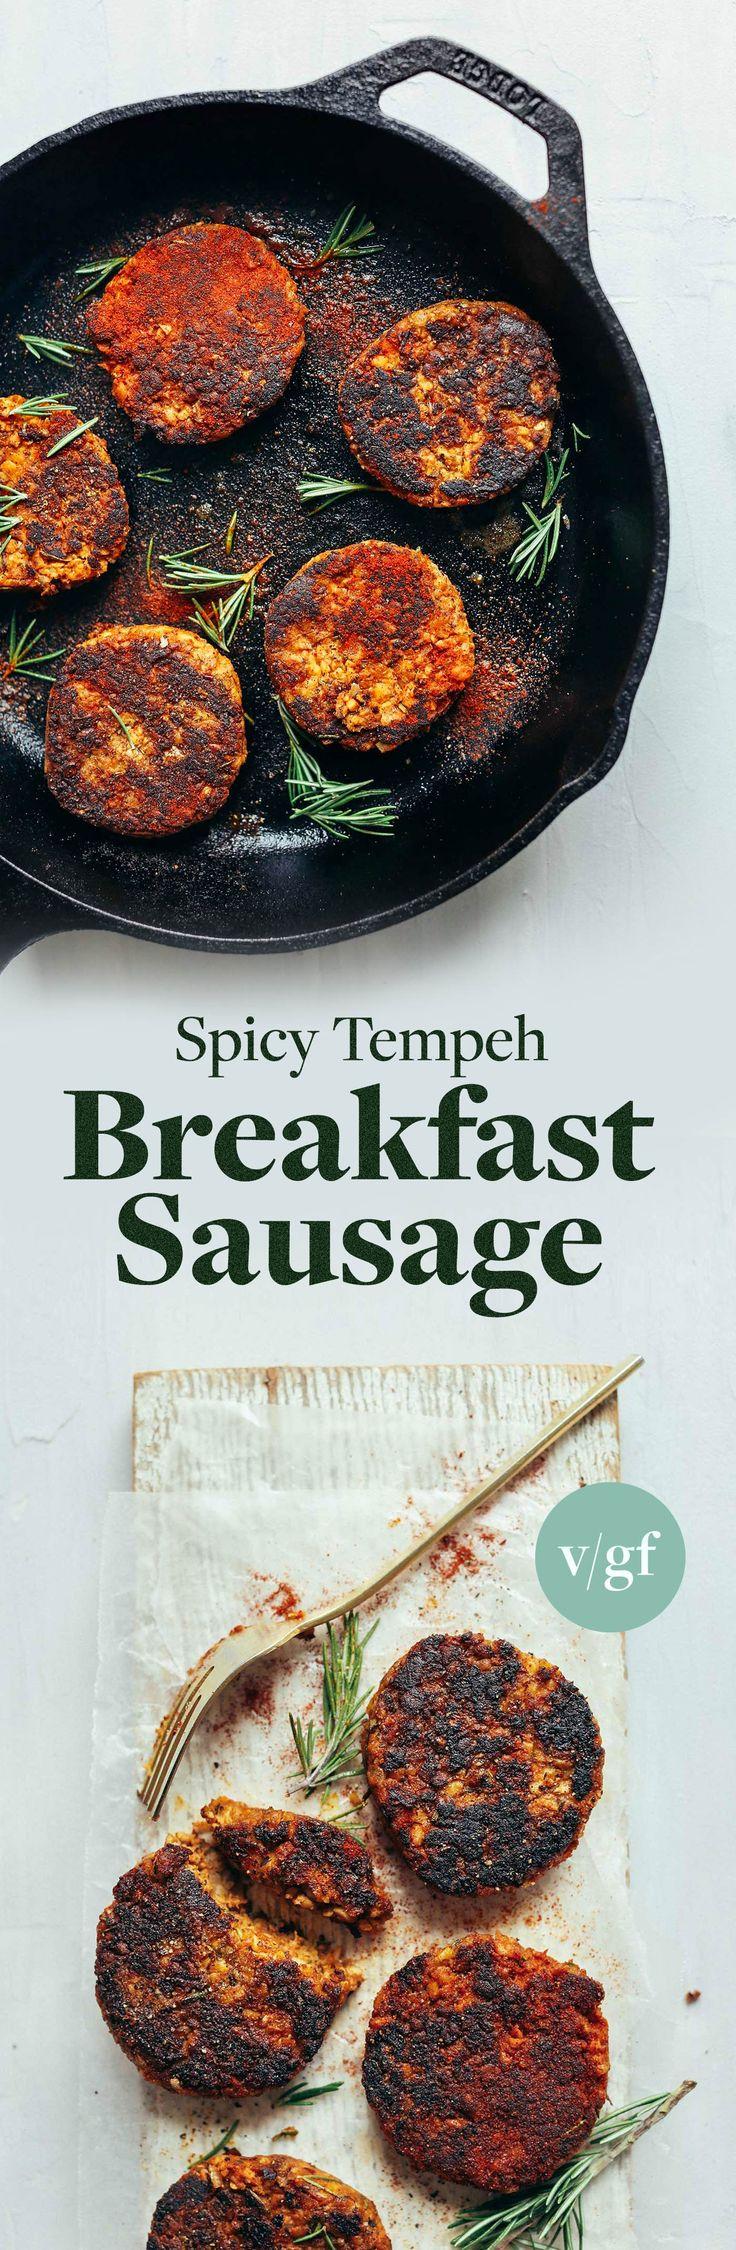 Spicy Tempeh Breakfast Sausage (vegan + gf) | Minimalist Baker